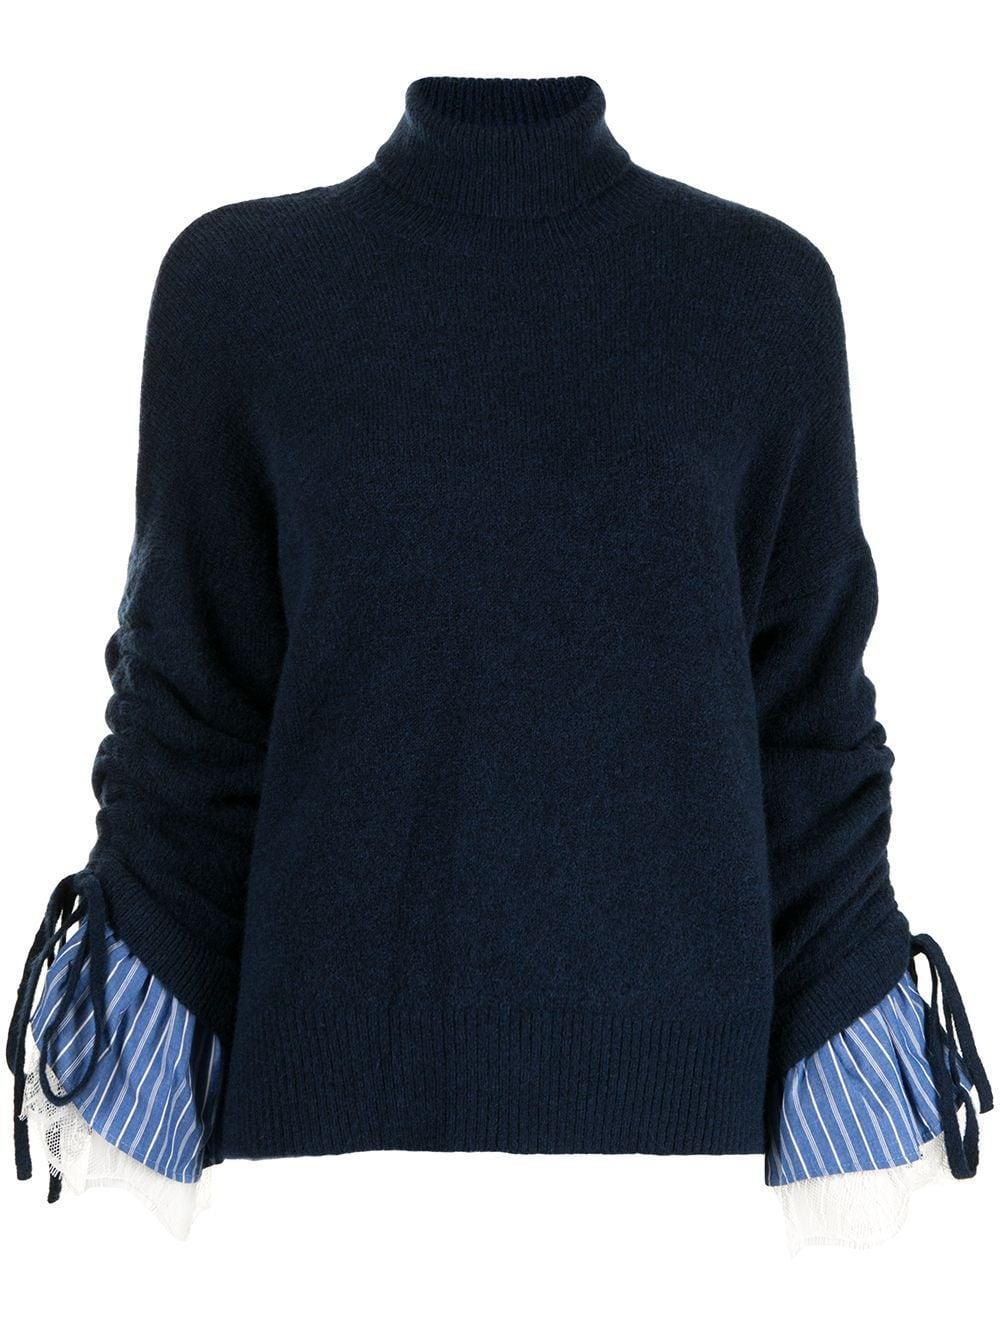 Atlas Turtleneck Sweater